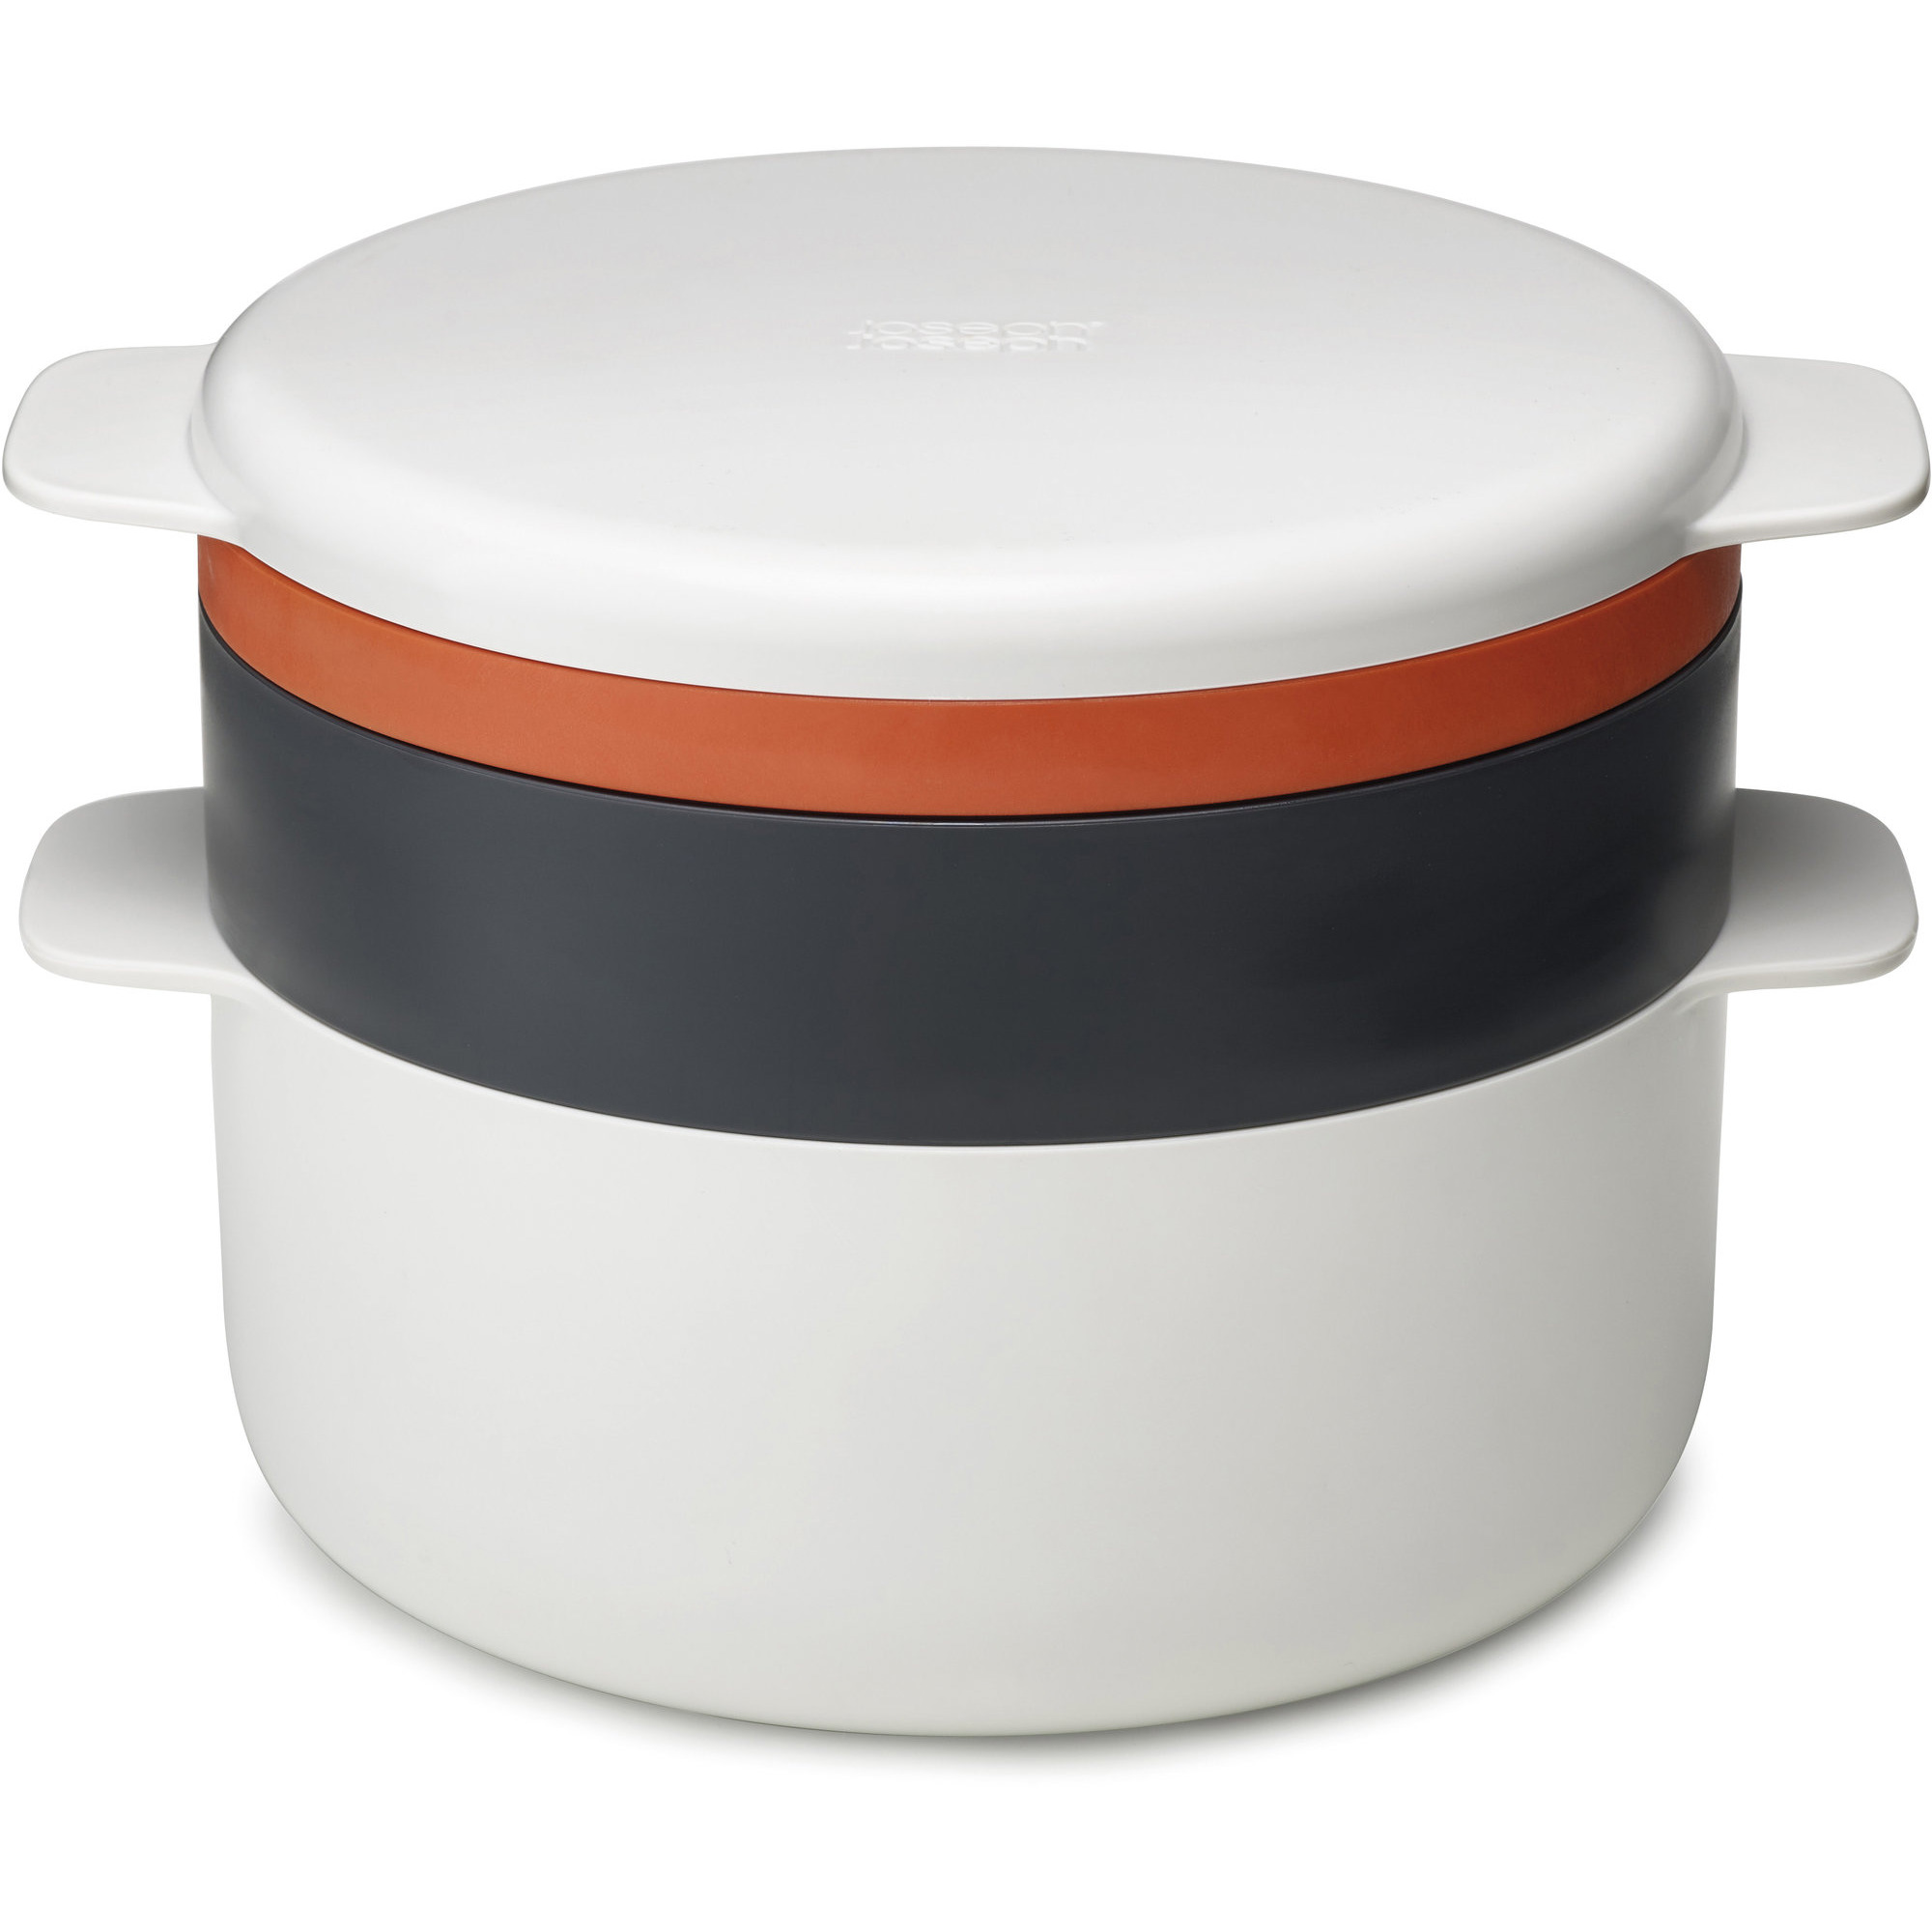 Joseph Joseph M-Cuisine kokare för mikrovågsugn 2L